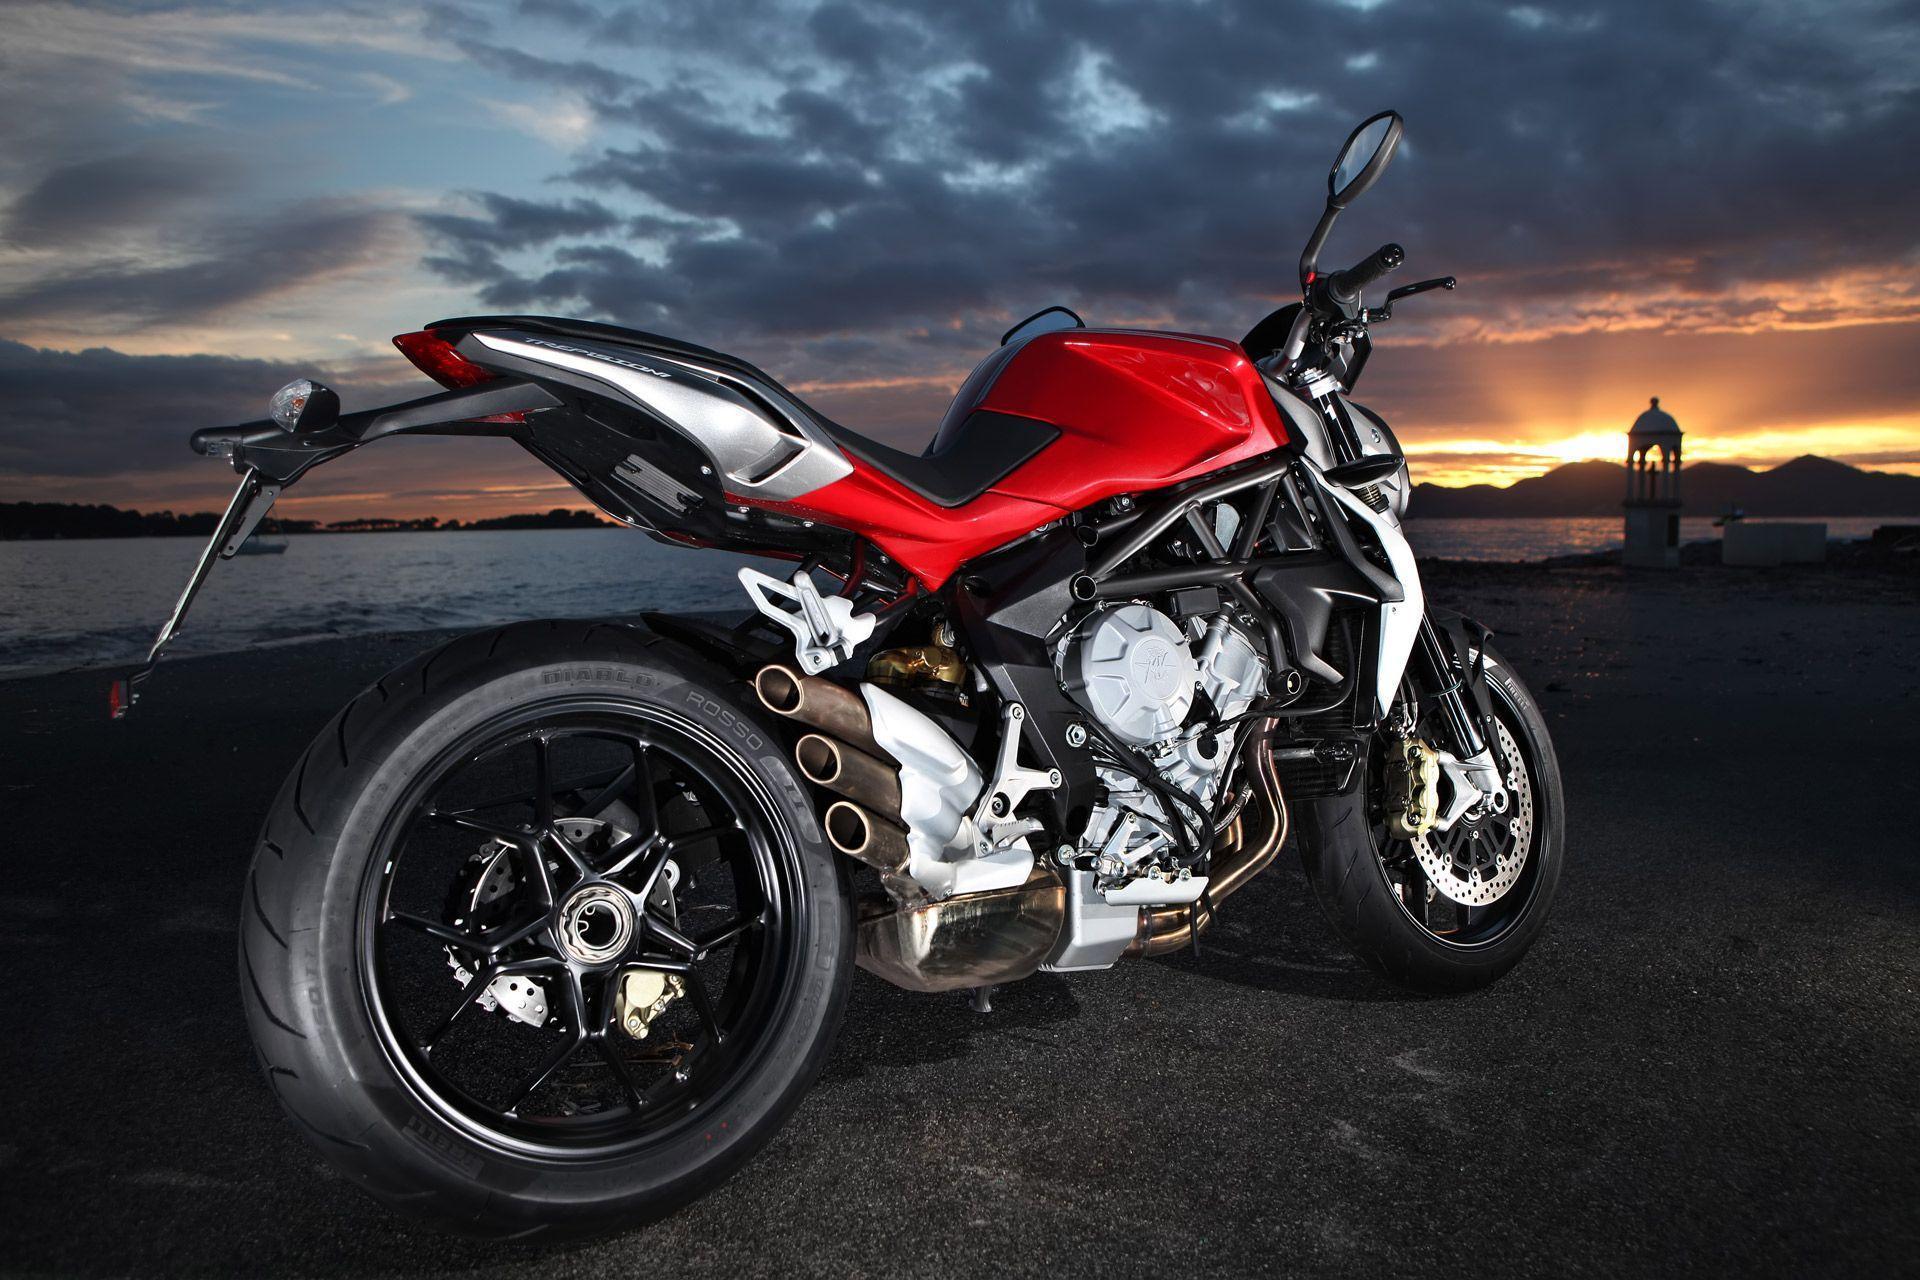 ukmoto import moto moto occasion moto anglaise moto angleterre 24 - ENQUETE SATISFACTION SUR L'ACHAT DE MOTO ANGLAISE UKMOTO IMPORT